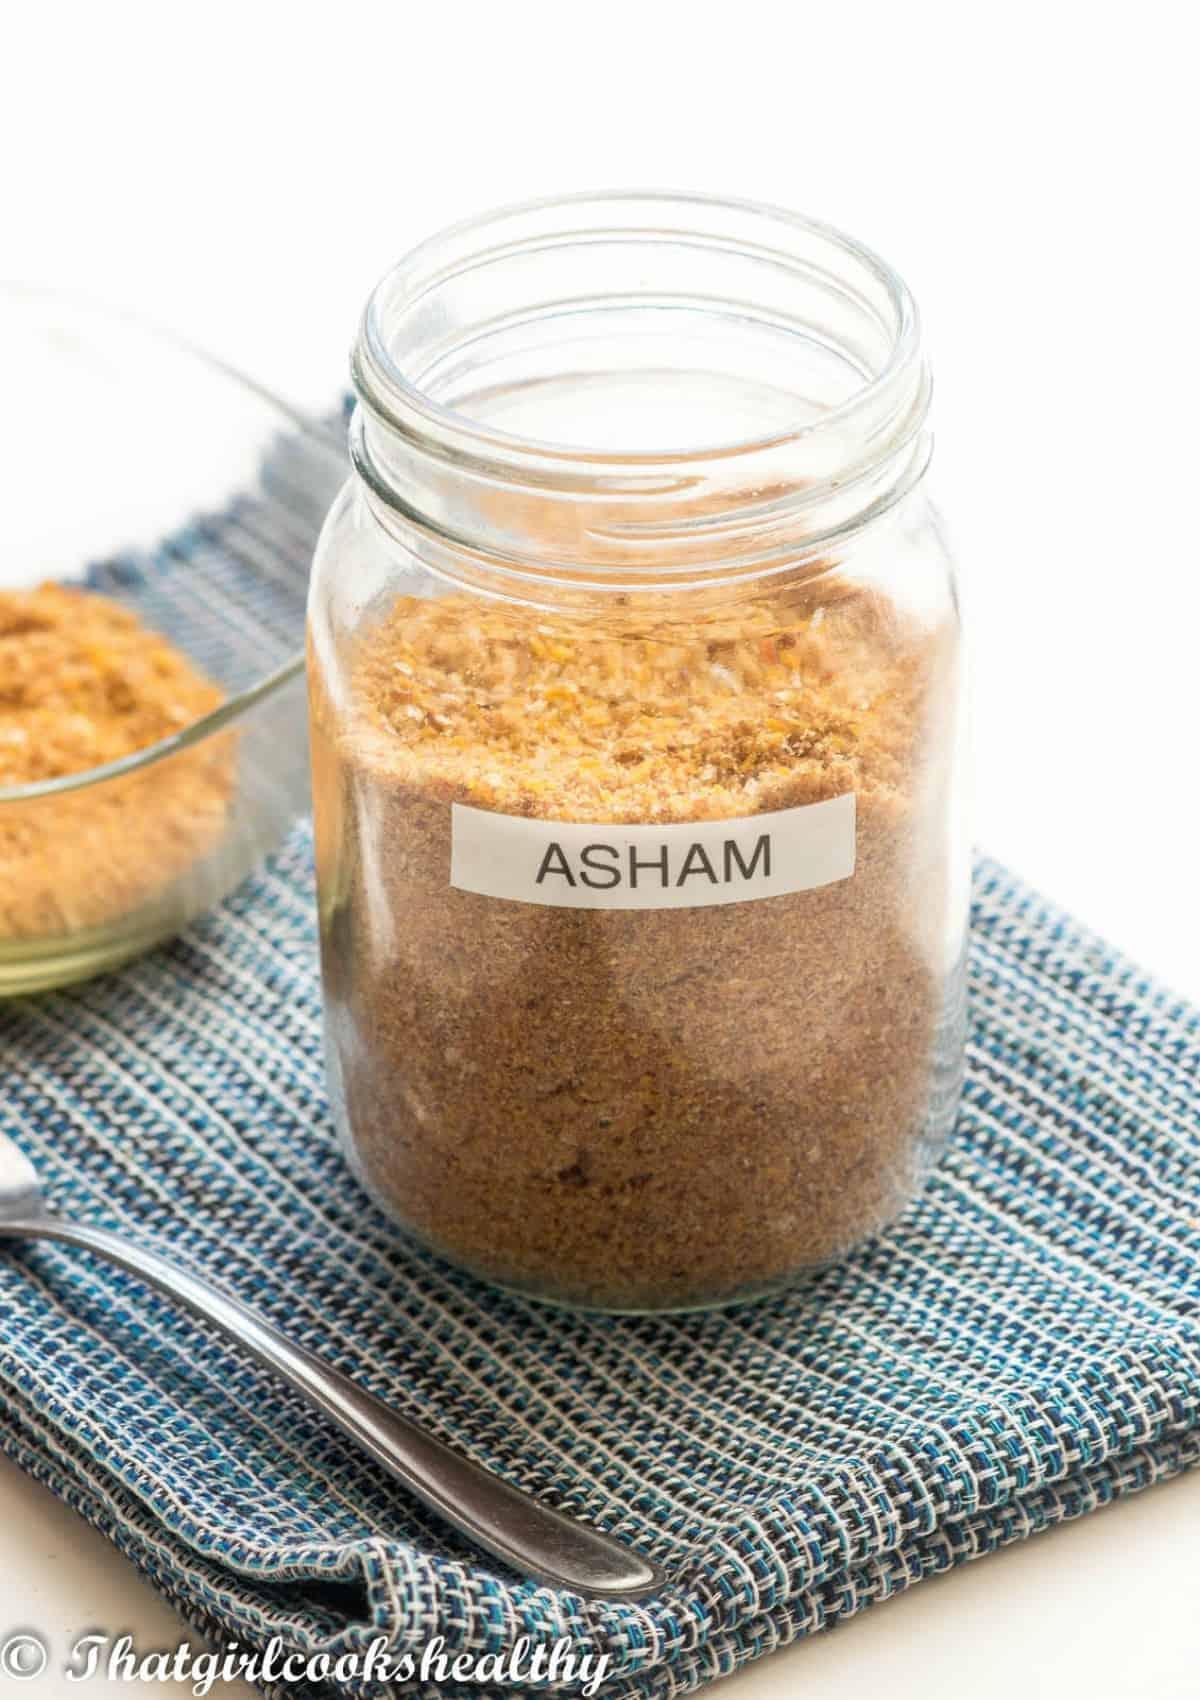 asham in a jar